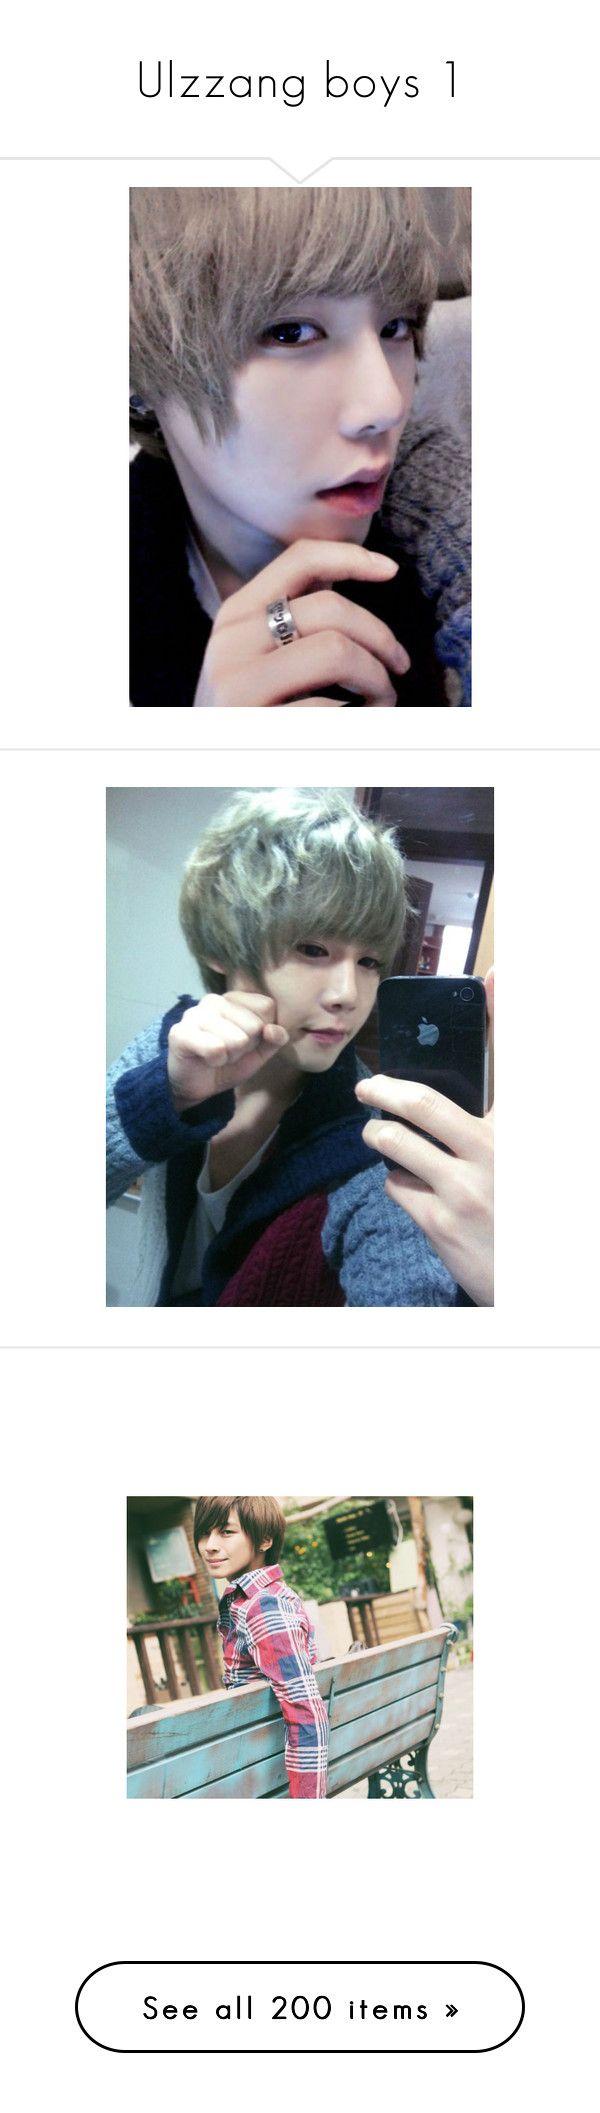 """Ulzzang boys 1"" by minibaozi ❤ liked on Polyvore featuring ulzzang, park jae hyun, home, home decor, won jong jin, park hyung seok and kiseop"